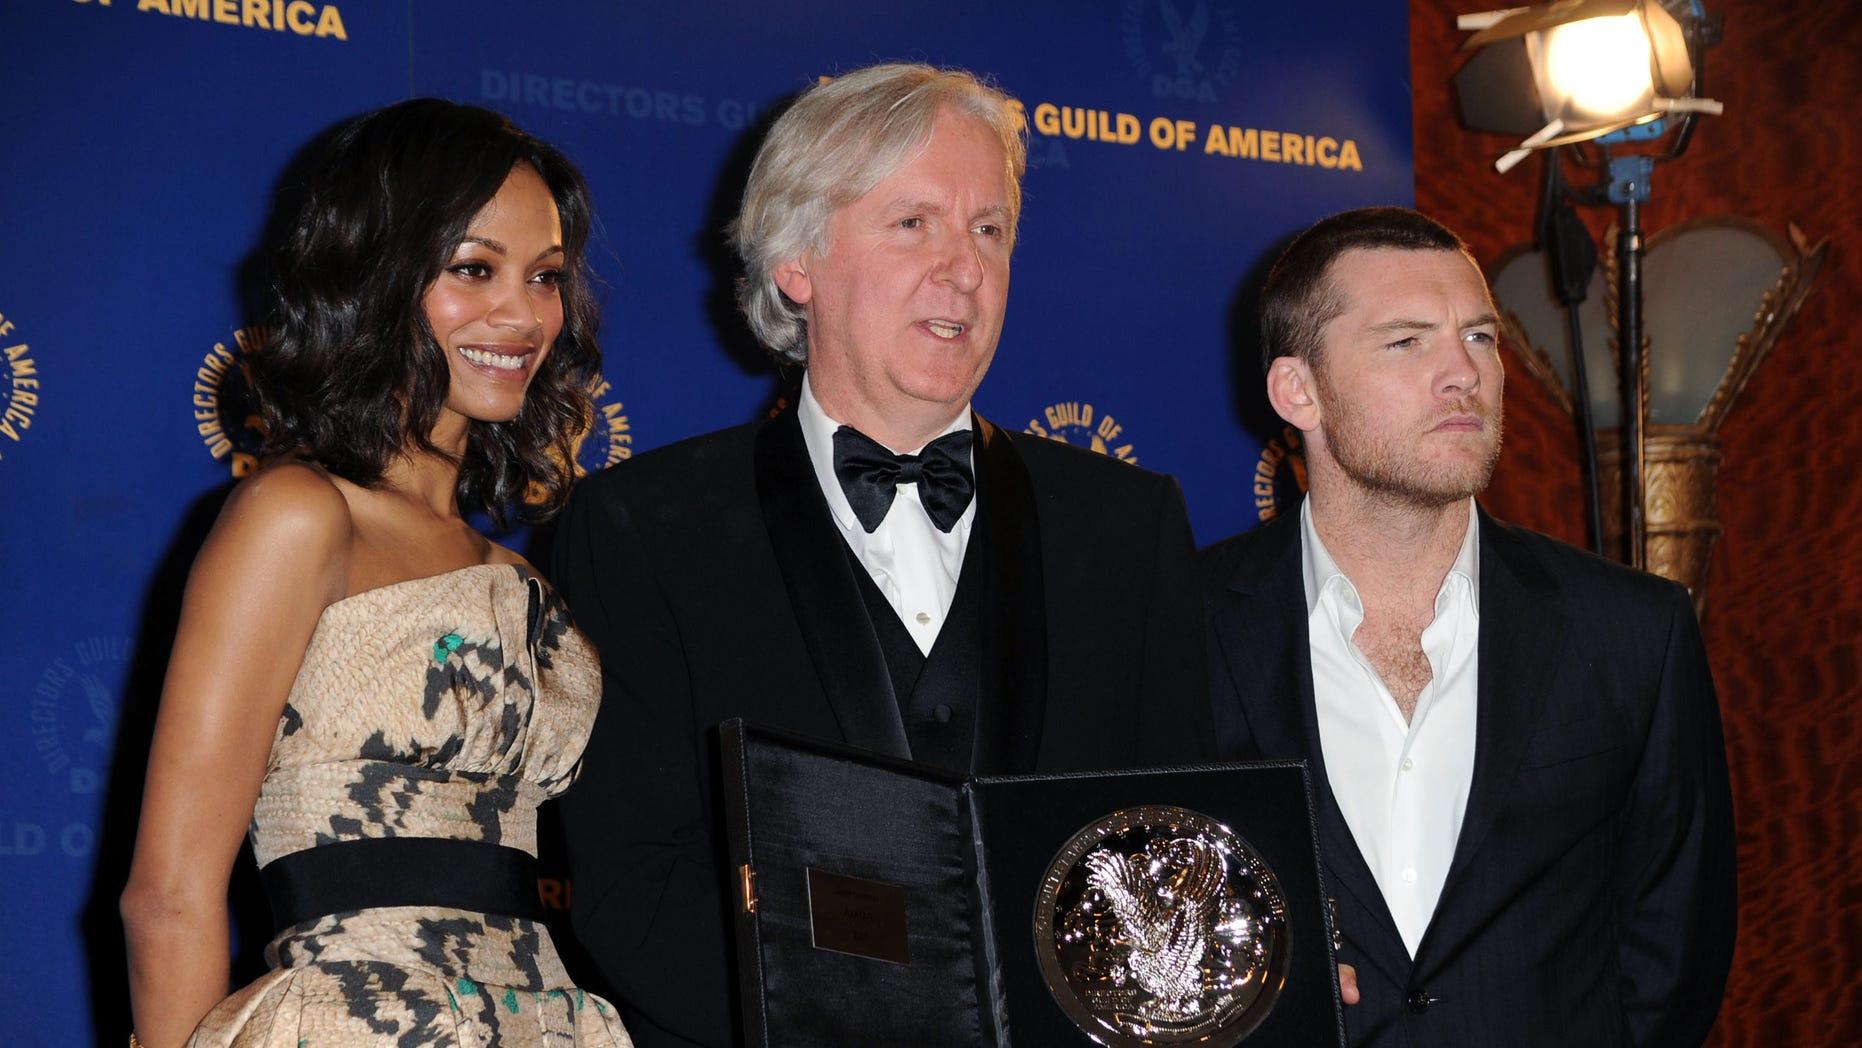 Zoe Saldana, James Cameron and Sam Worthington on January 30, 2010 in Century City, California.